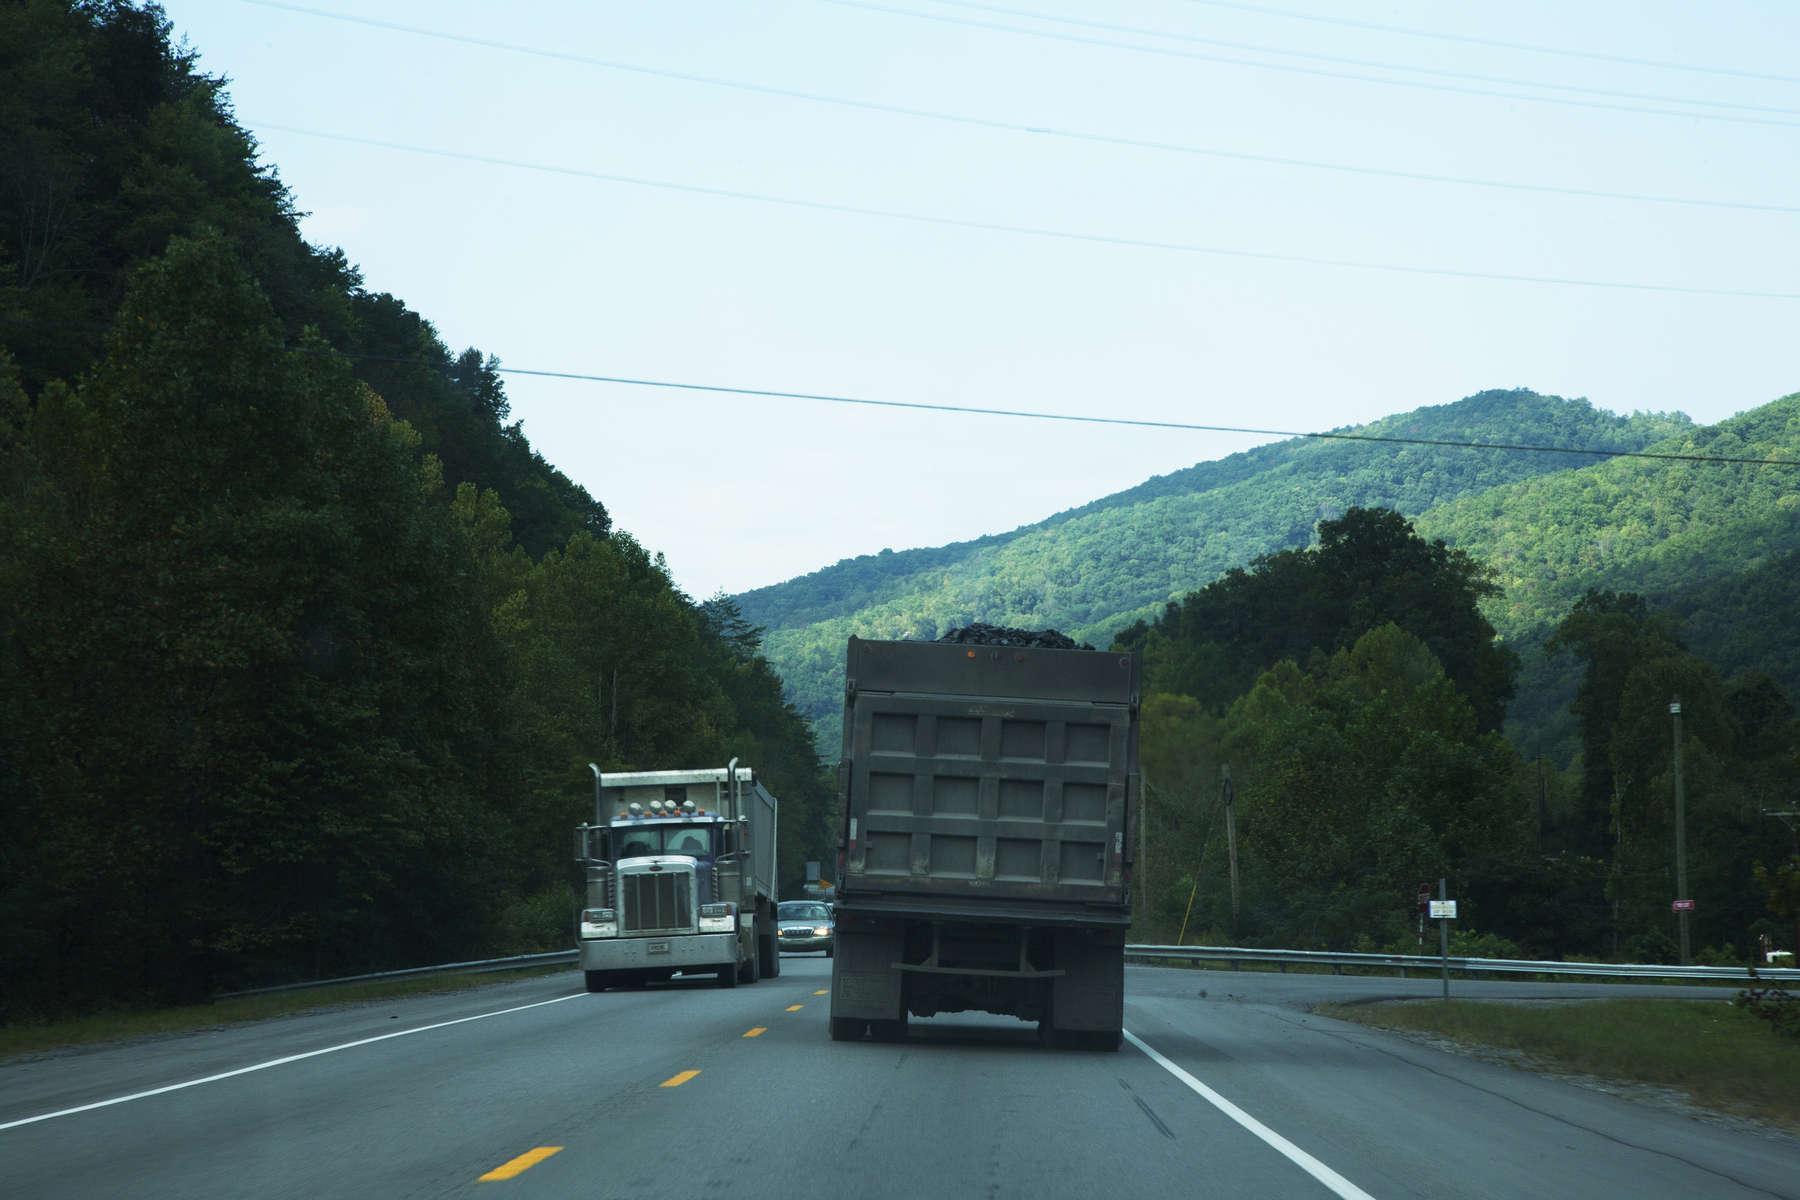 Coal TrucksHarlan County, KY